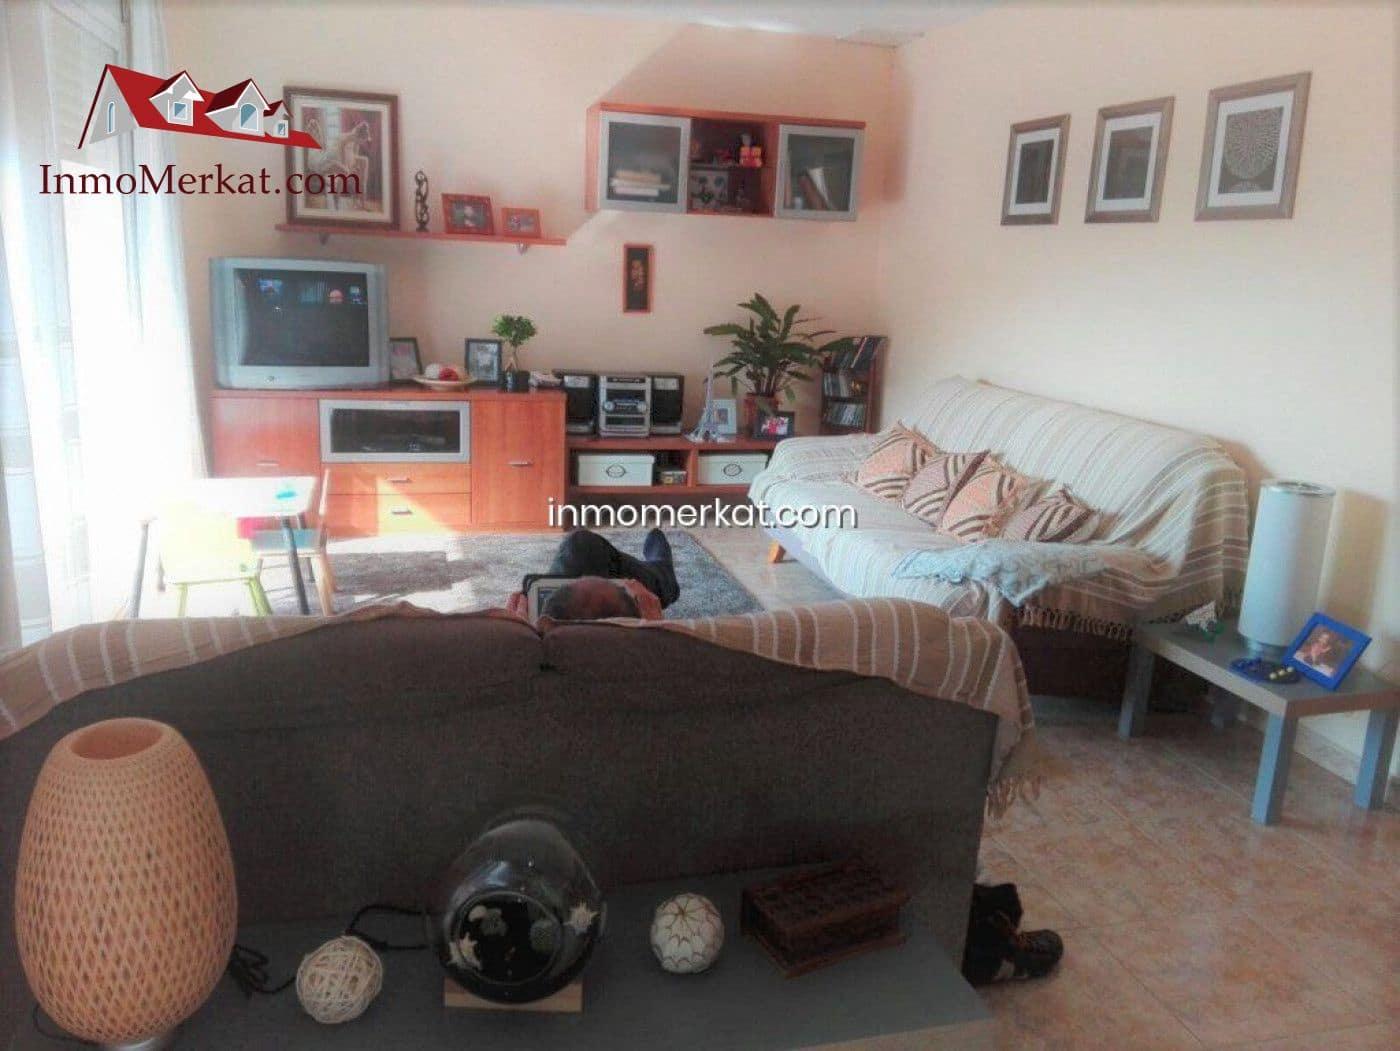 3 bedroom Villa for sale in Lloret de Mar with garage - € 245,000 (Ref: 6170437)